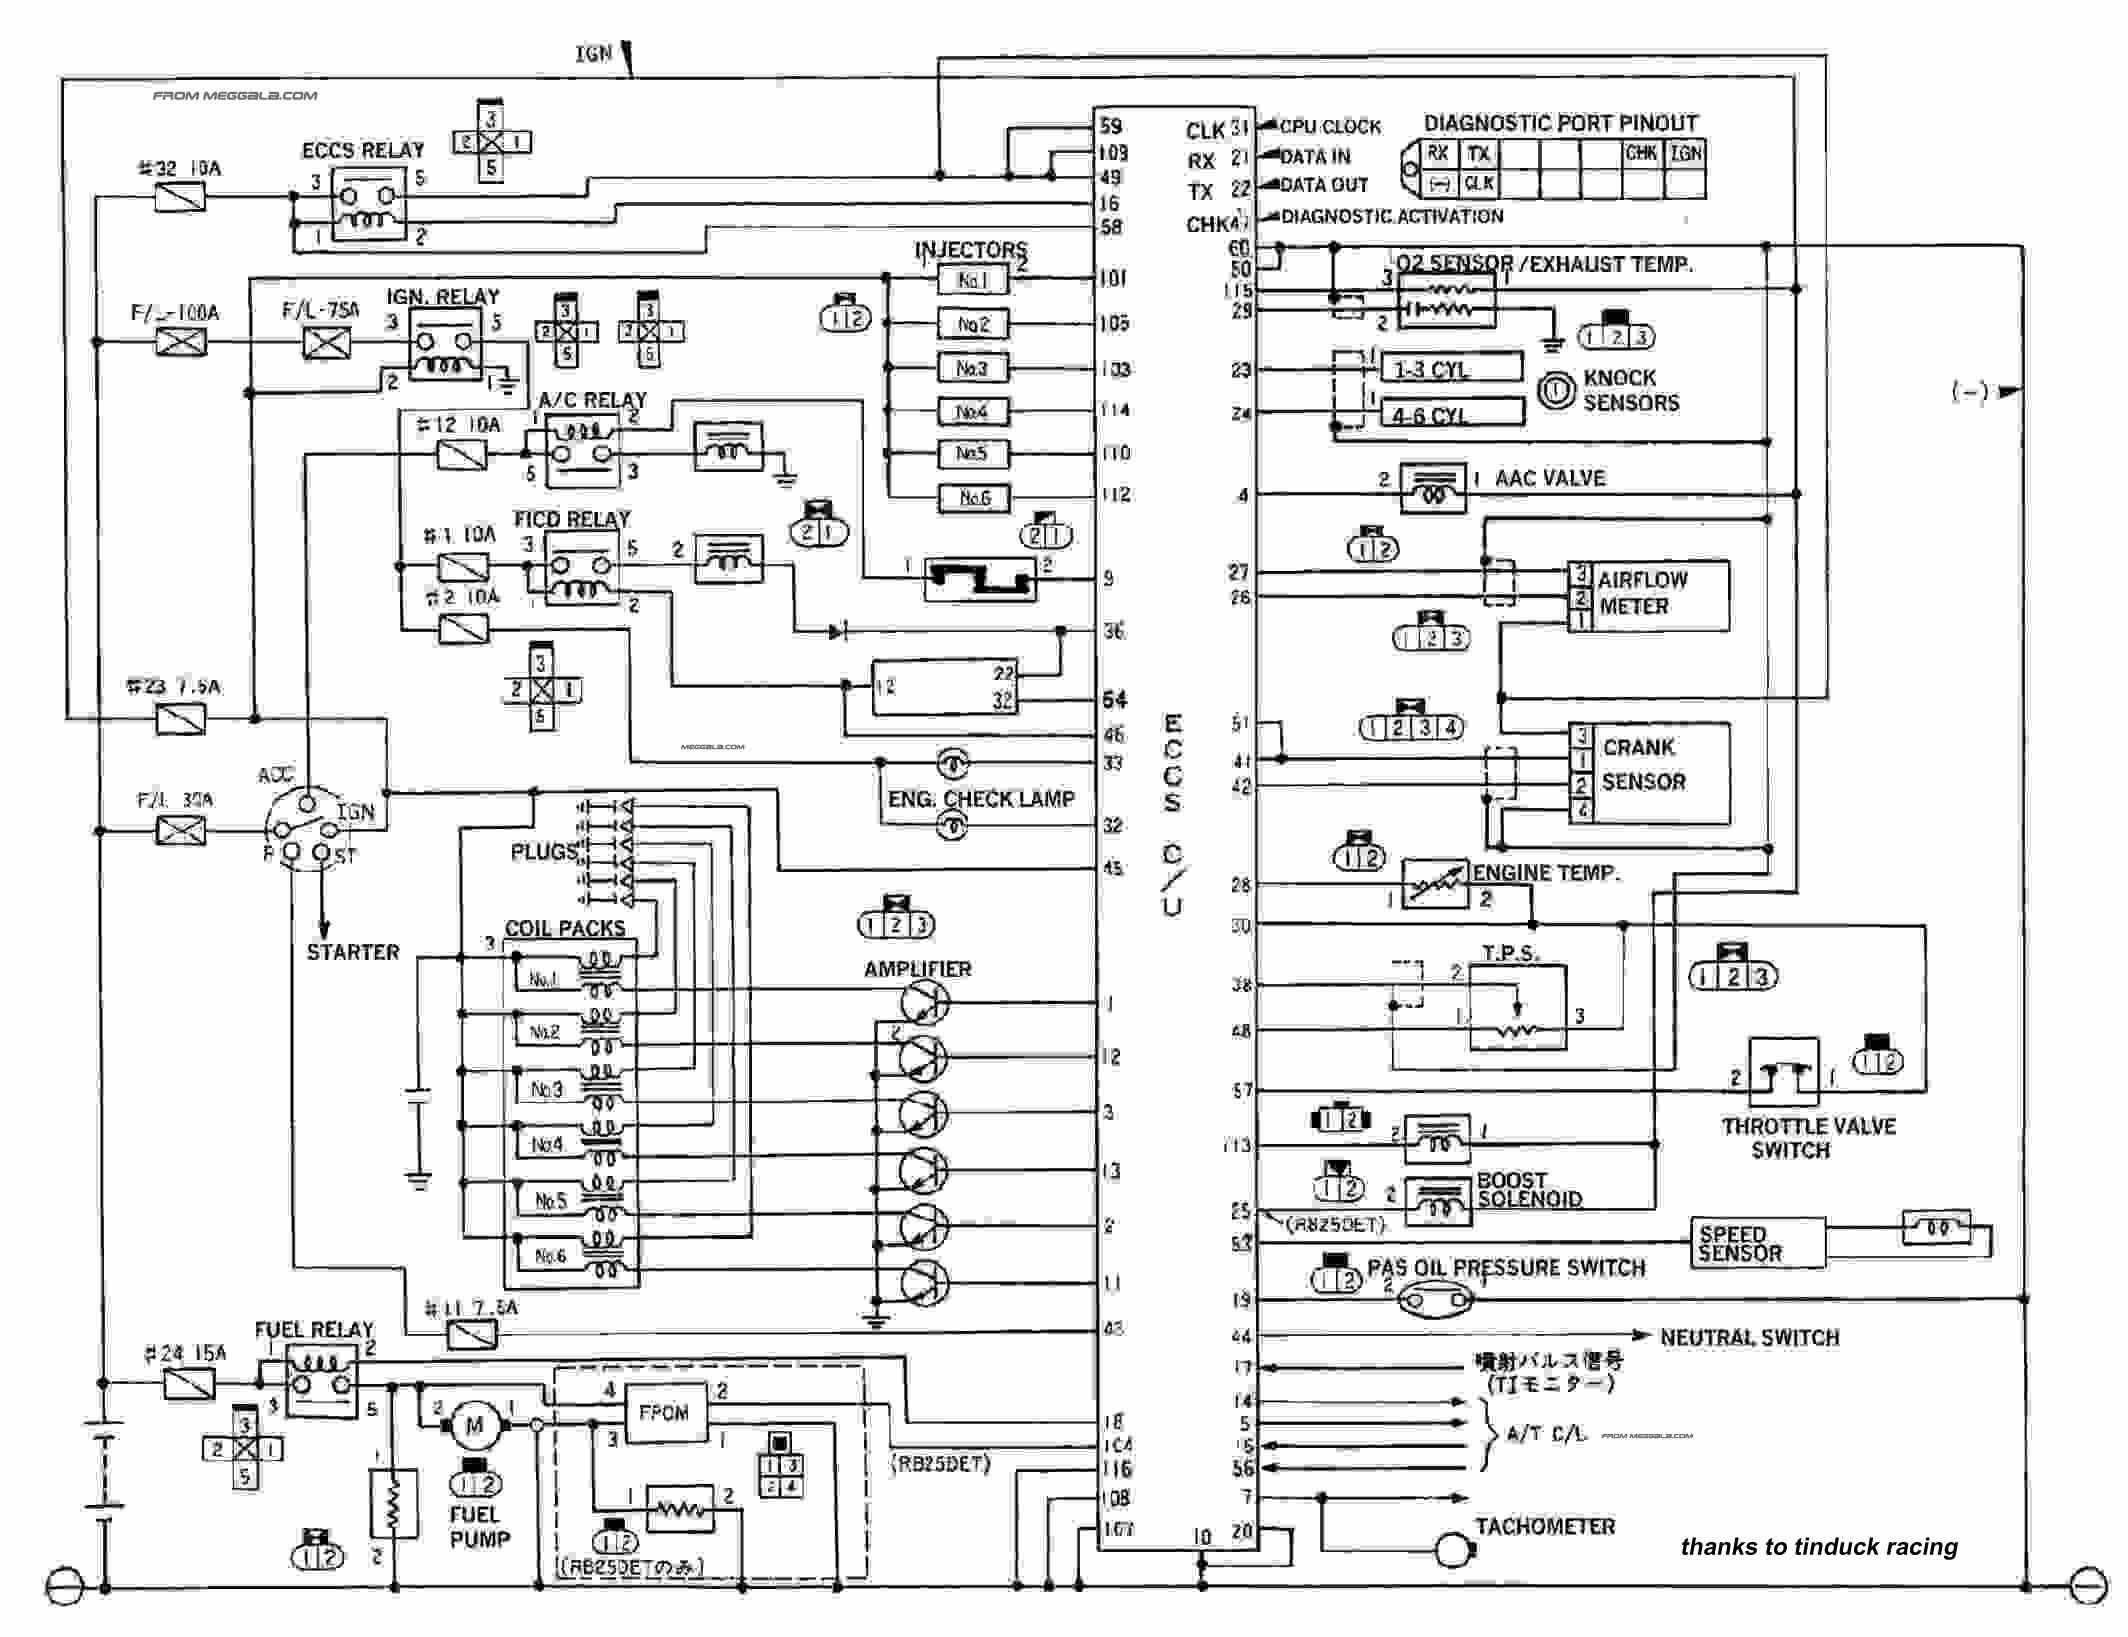 WIRING DIAGRAM Nissan Skyline Fuse Box Diagram FULL